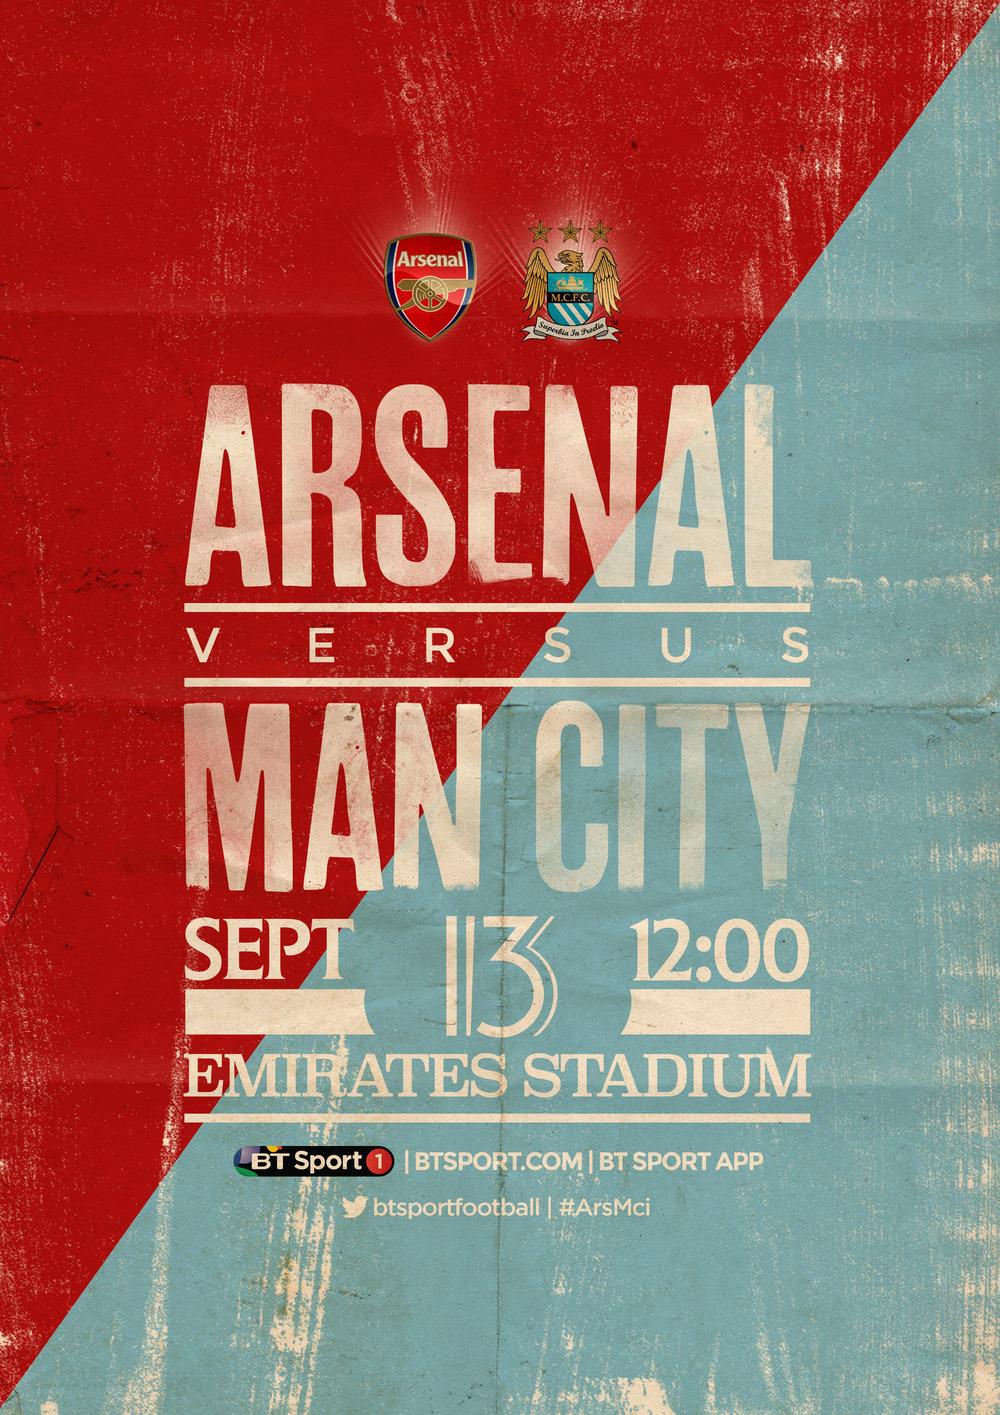 ArsenalVsCityv2.jpg